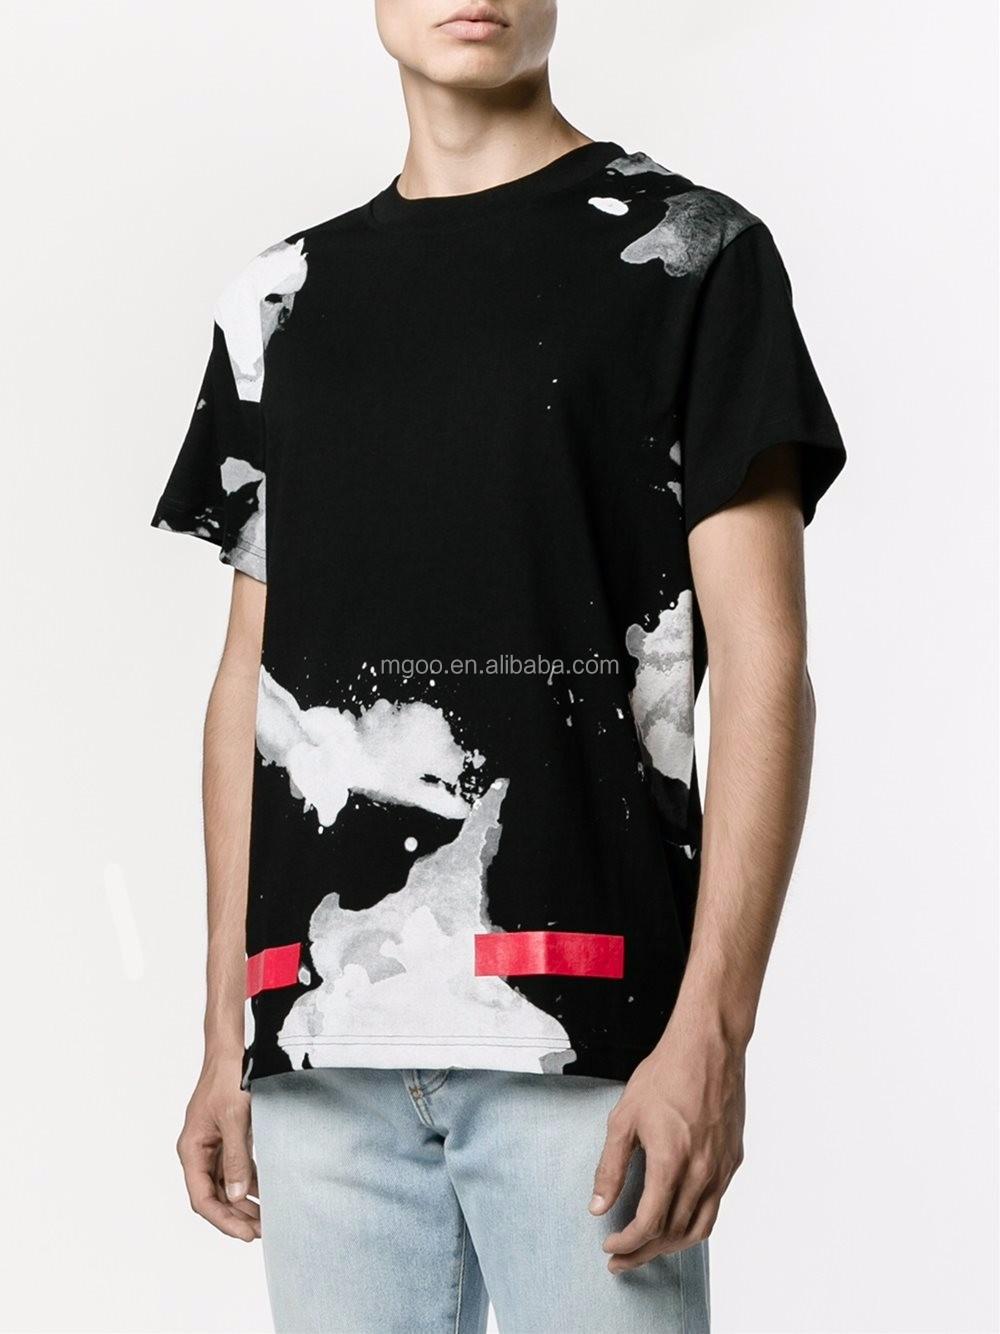 Apparel Full Screen Print Black Unique T Shirt Printing Short Sleeve